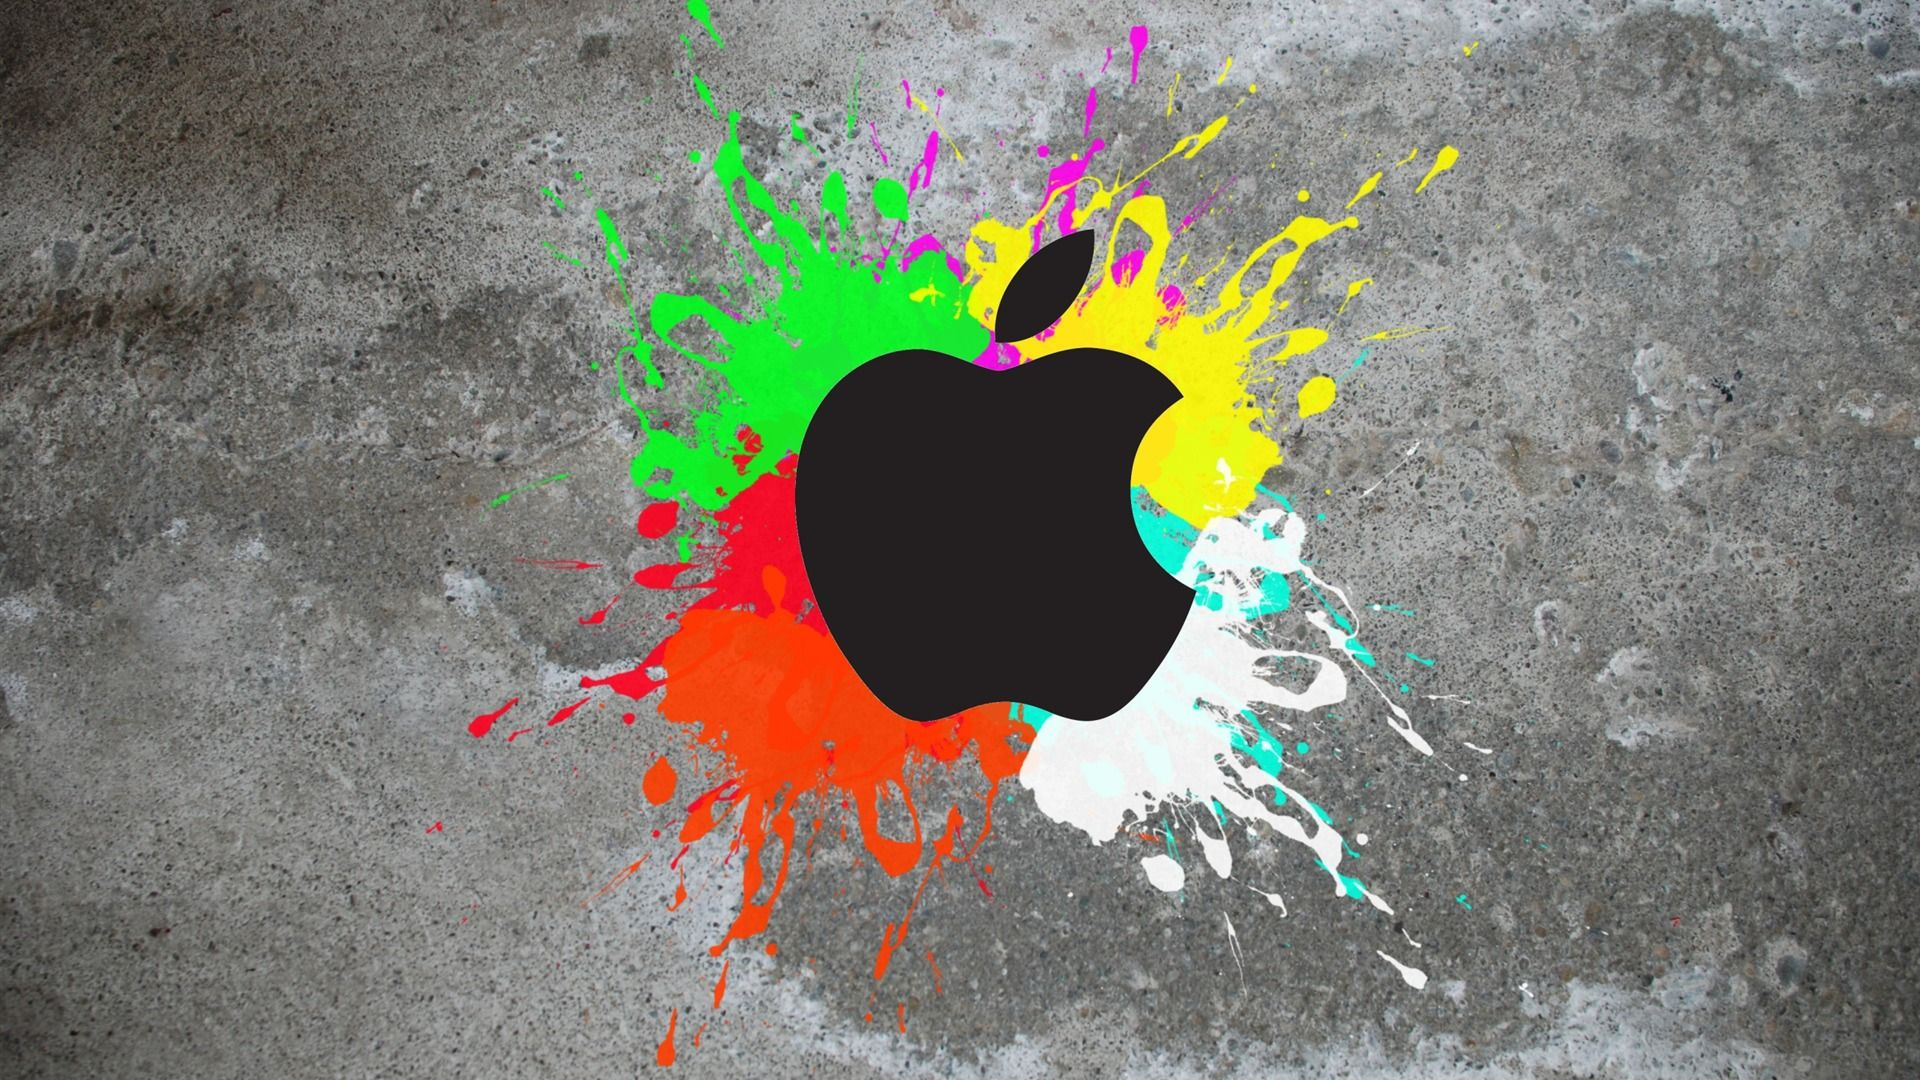 4k Apple Wallpaper